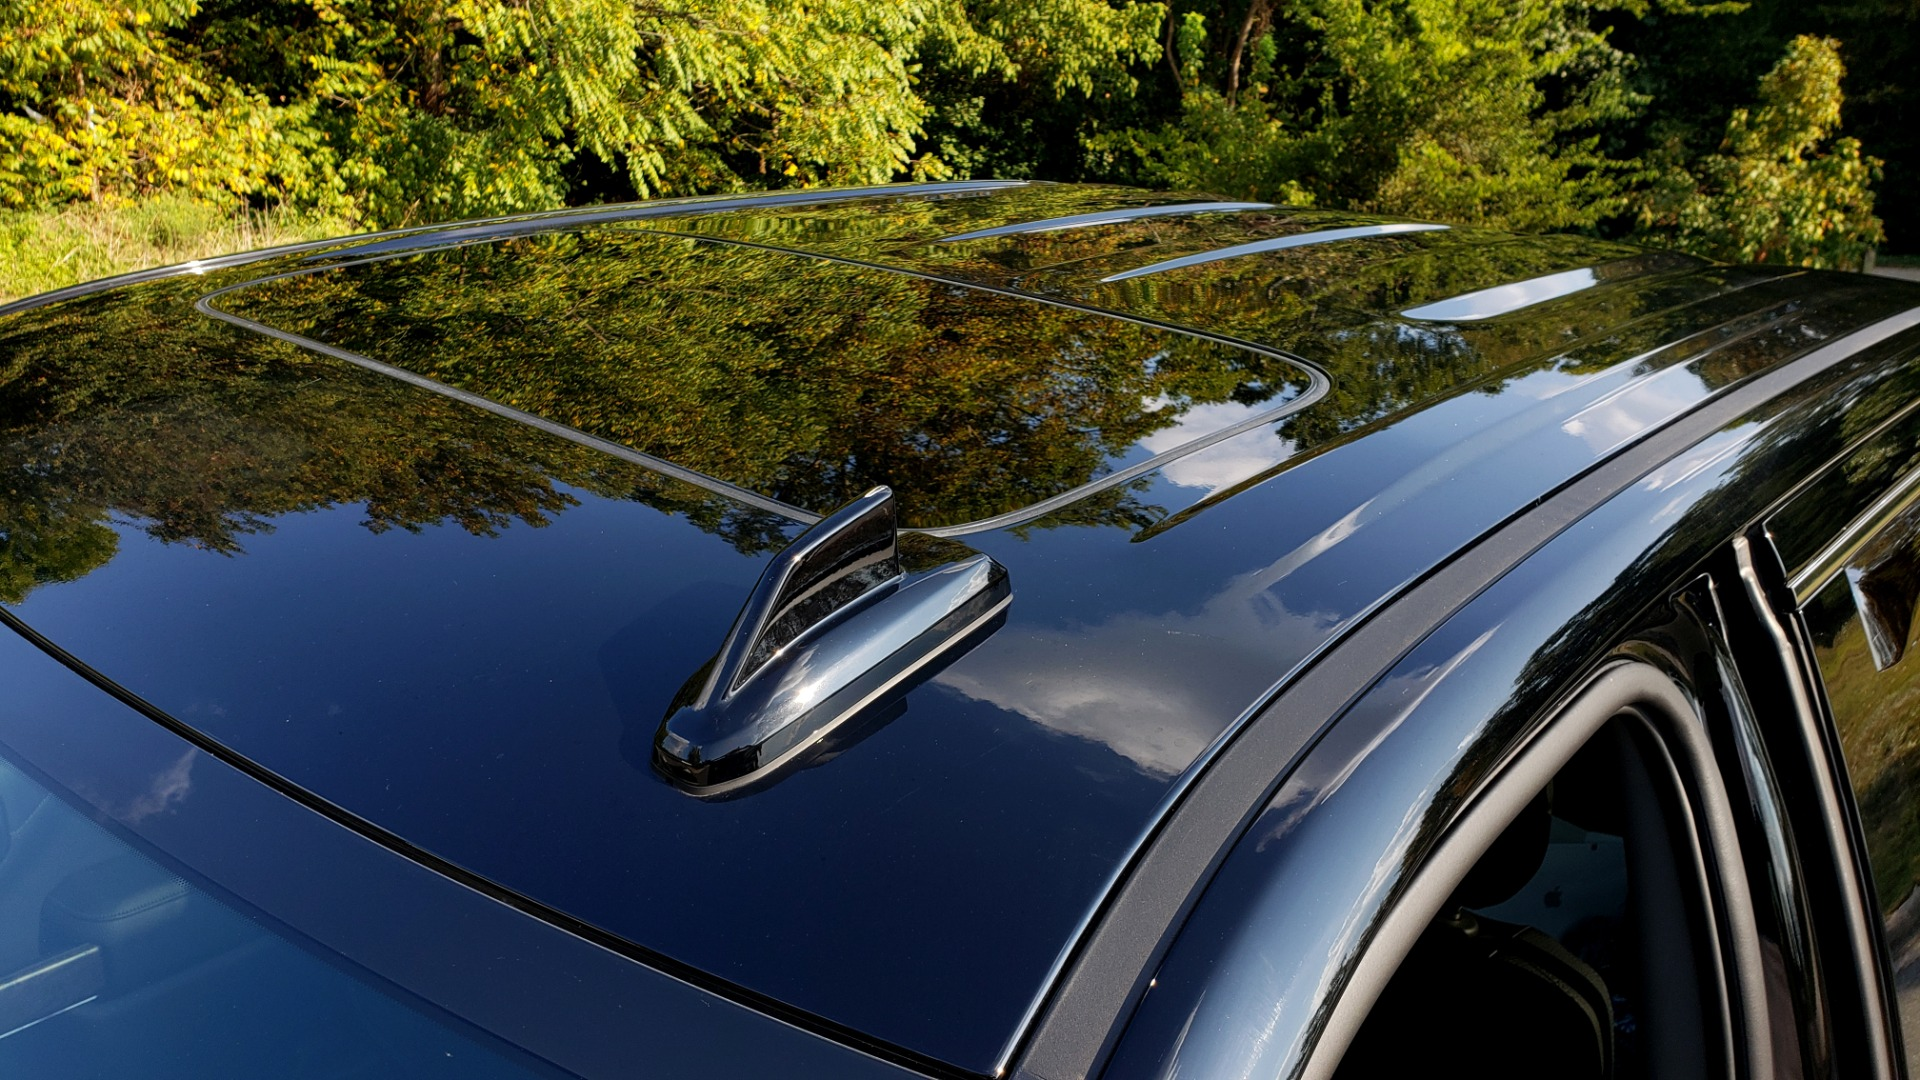 Used 2019 GMC SIERRA 1500 DENALI ULTIMATE 4WD / NAV / TECH PKG / DRVR ALRT for sale Sold at Formula Imports in Charlotte NC 28227 9